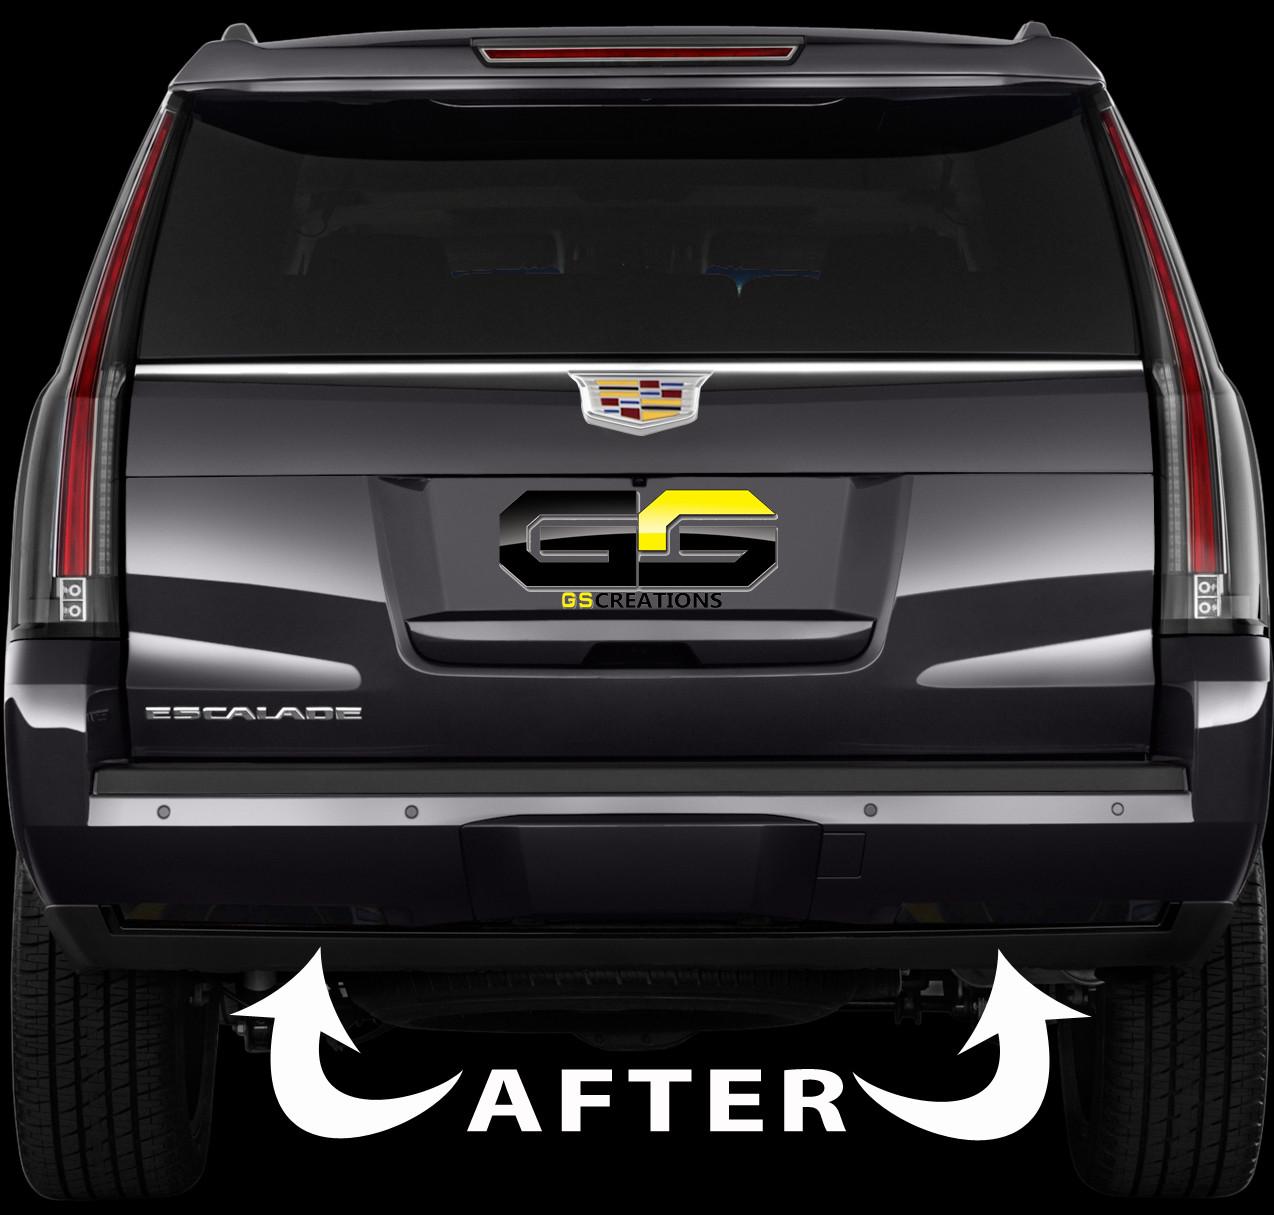 New Corvette Stingray >> 2015 - 2018 Cadillac Escalade Rear Bumper Reflector ...